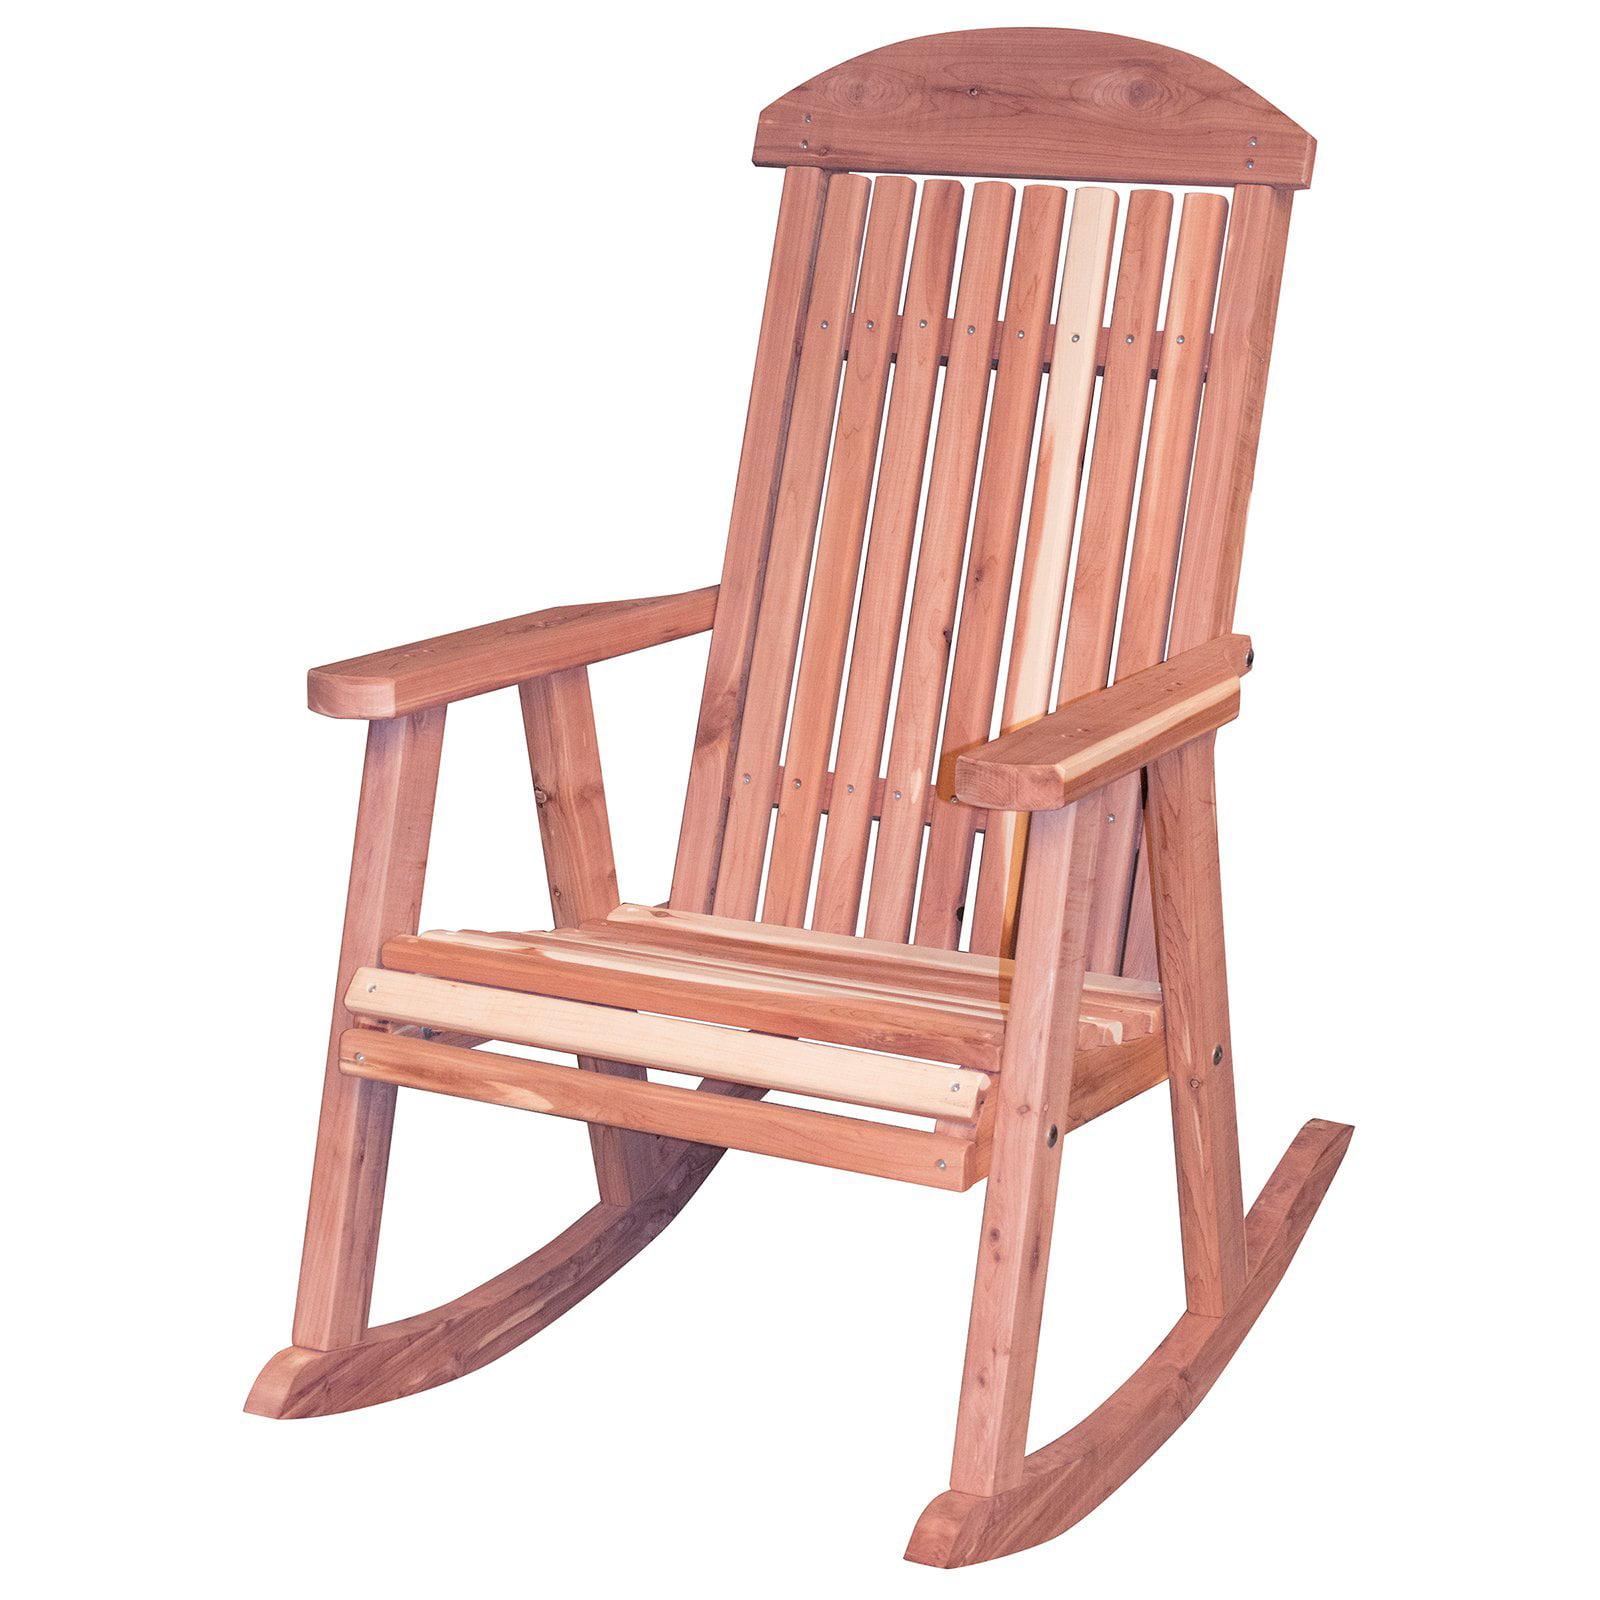 Buffalo Tool AmeriHome USA Amish Made Cedar Rocking Chair